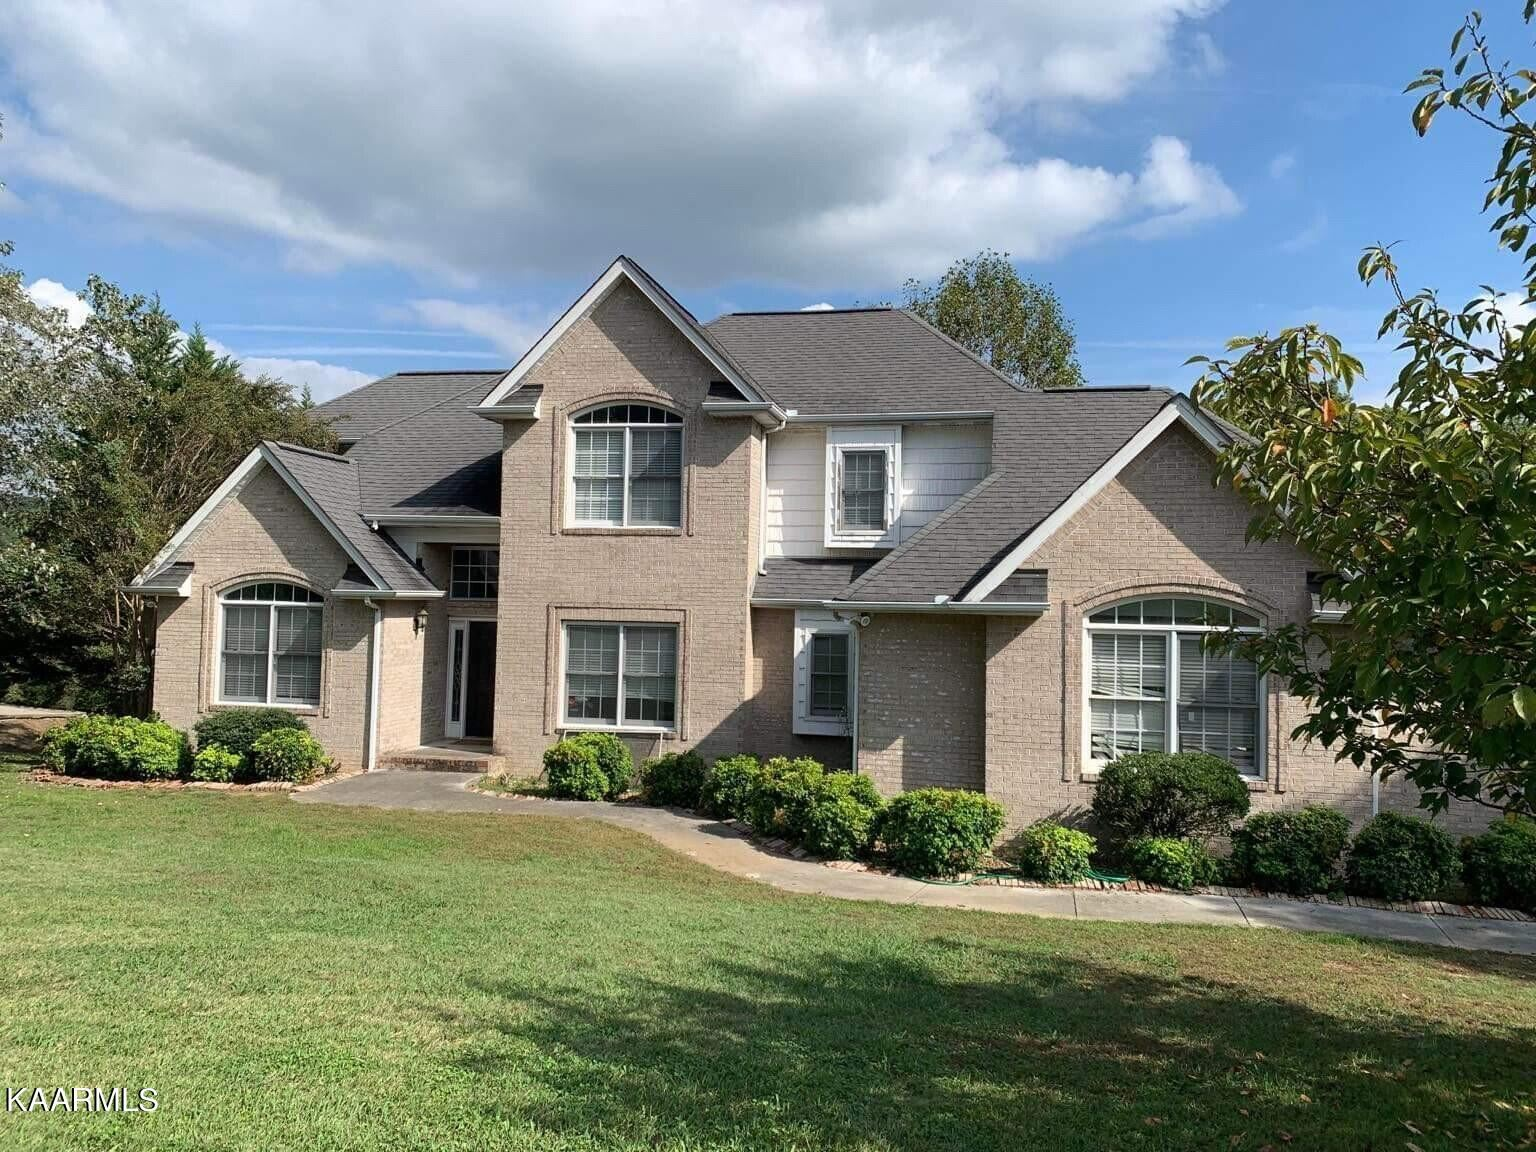 Photo of 53 Riverside Drive, Oak Ridge, TN 37830 (MLS # 1171864)